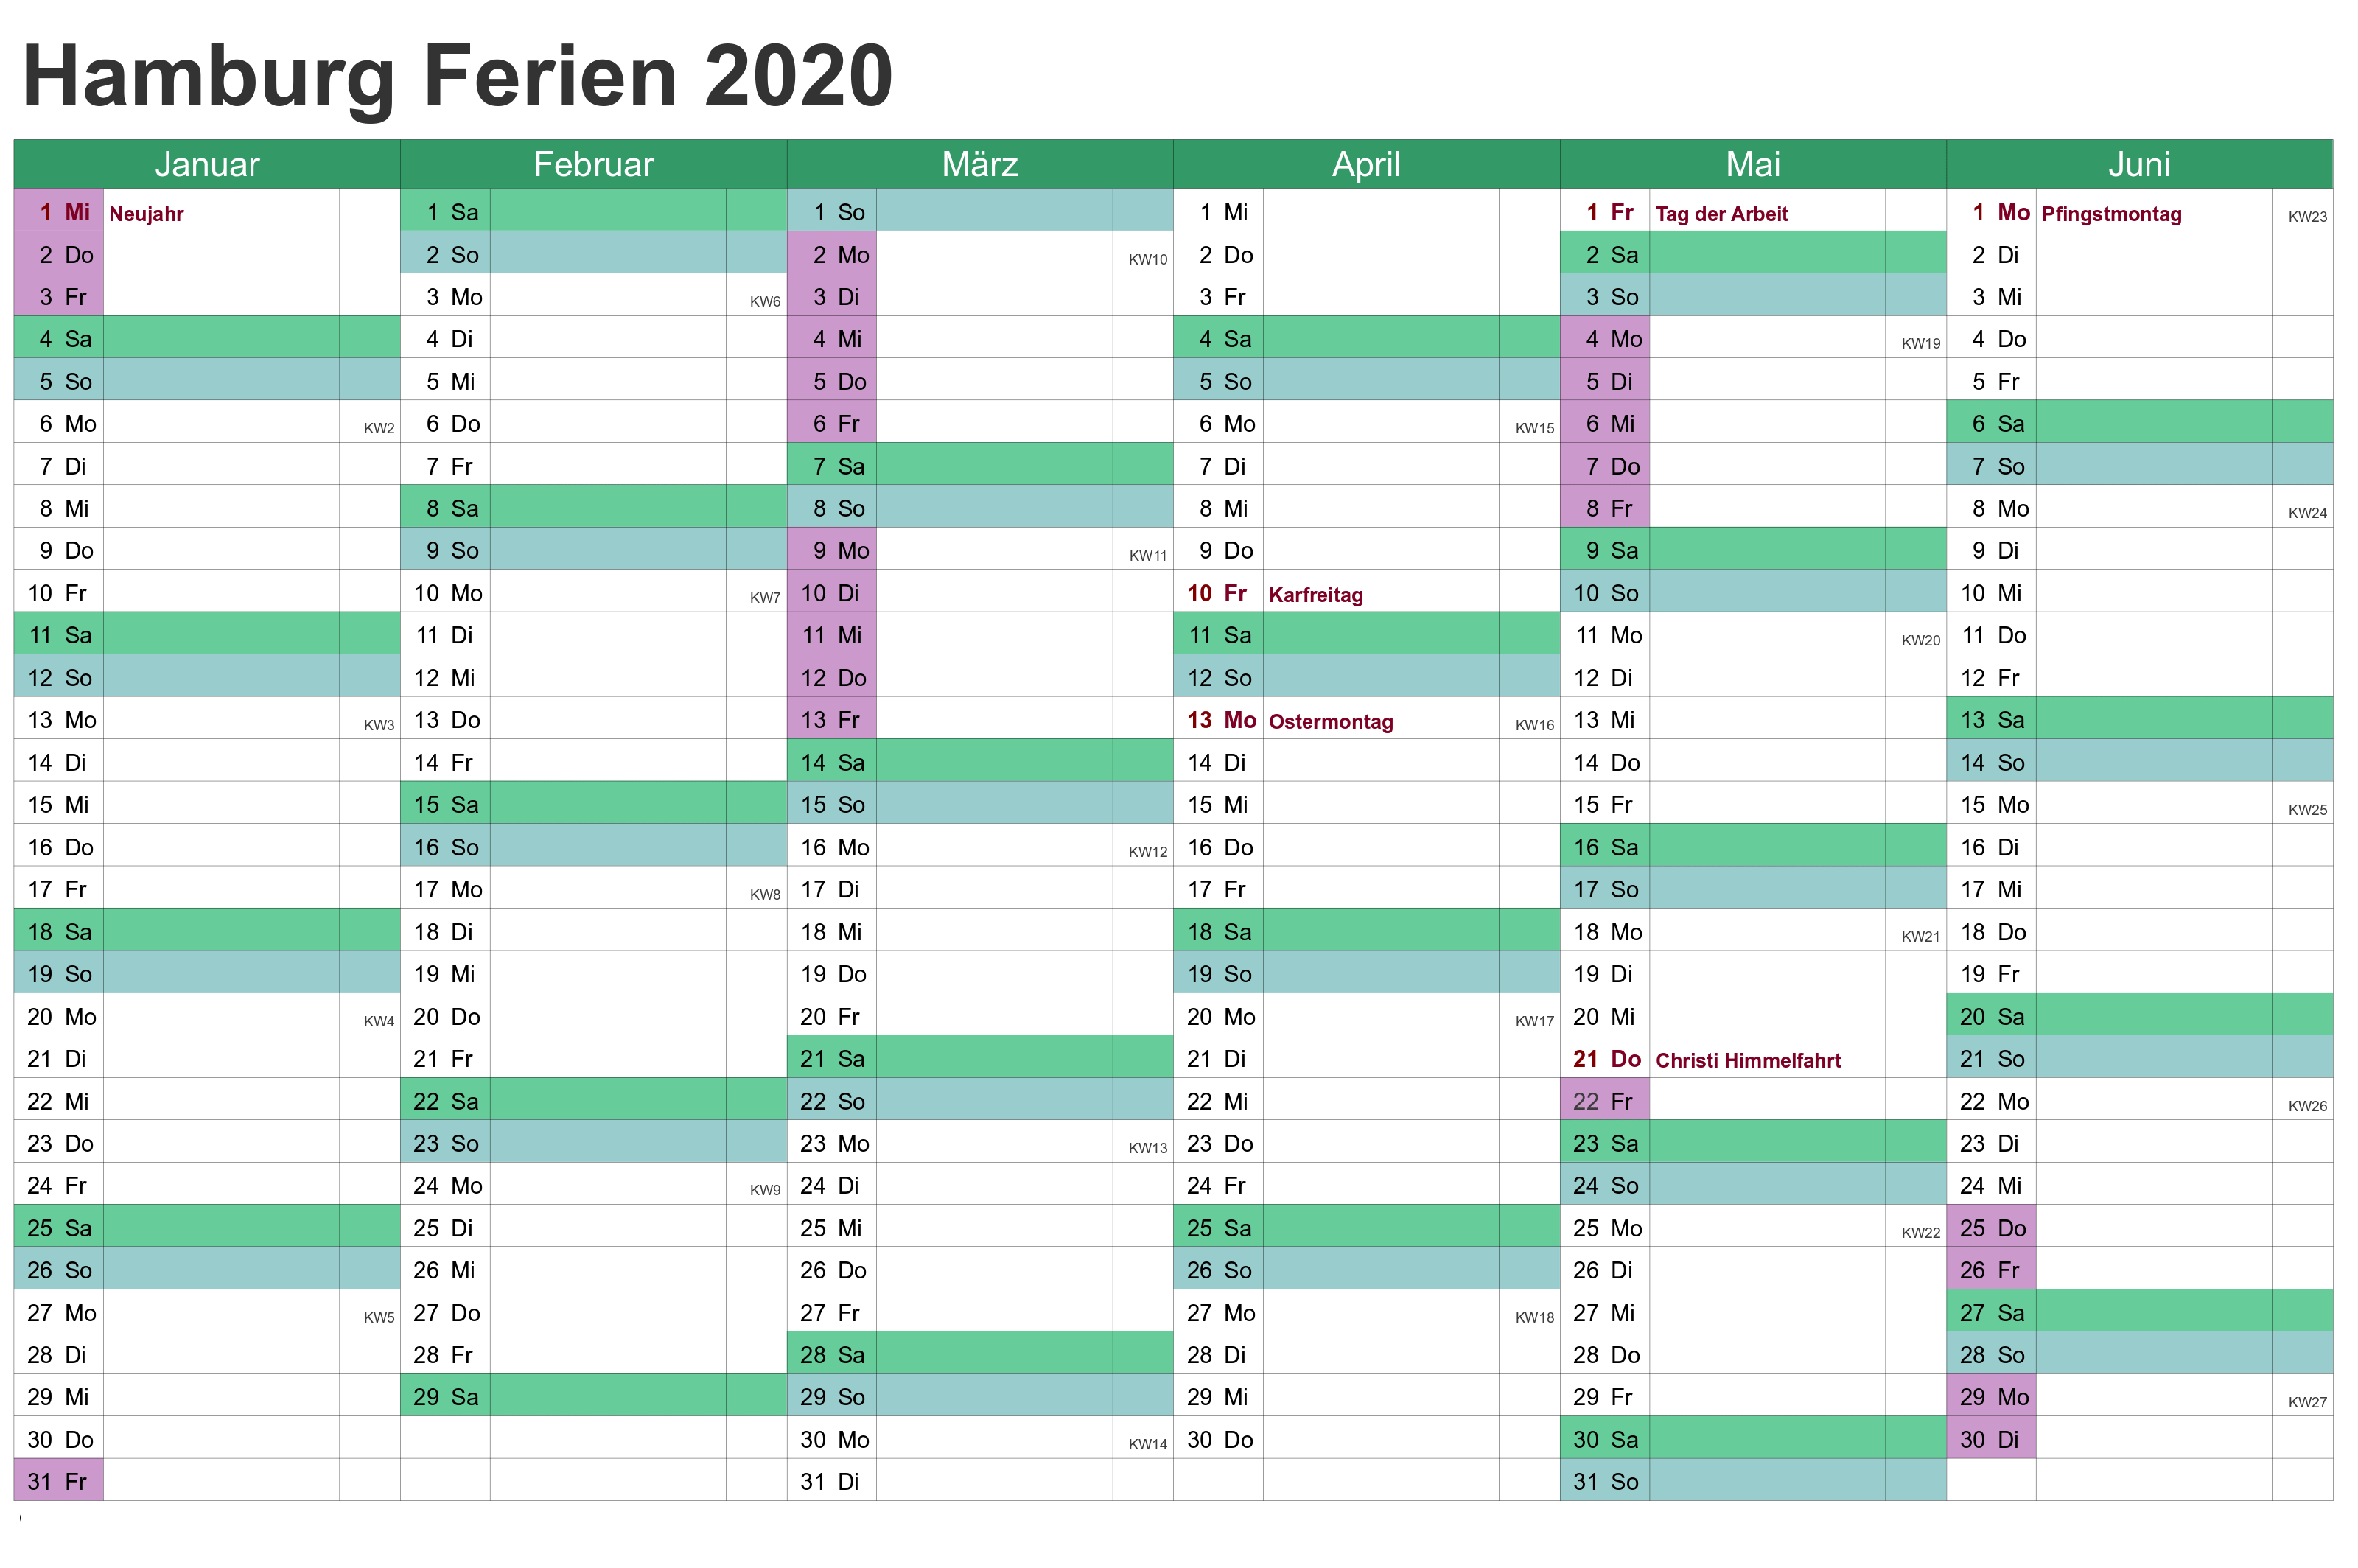 Ferien 2020 Hamburg Kalender PDF